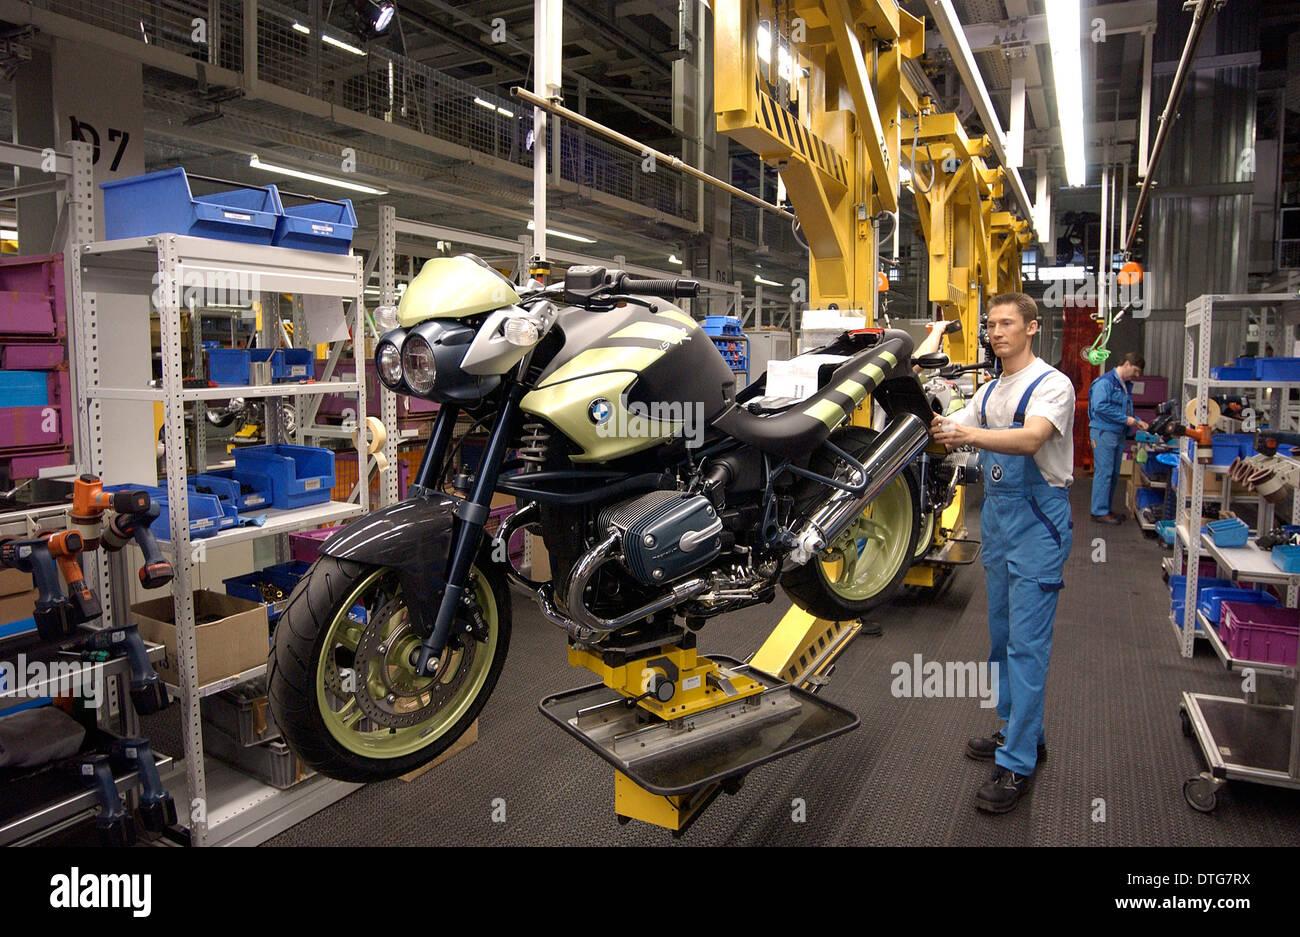 BMW Motorrad factory Stock Photo: 66740238 - Alamy